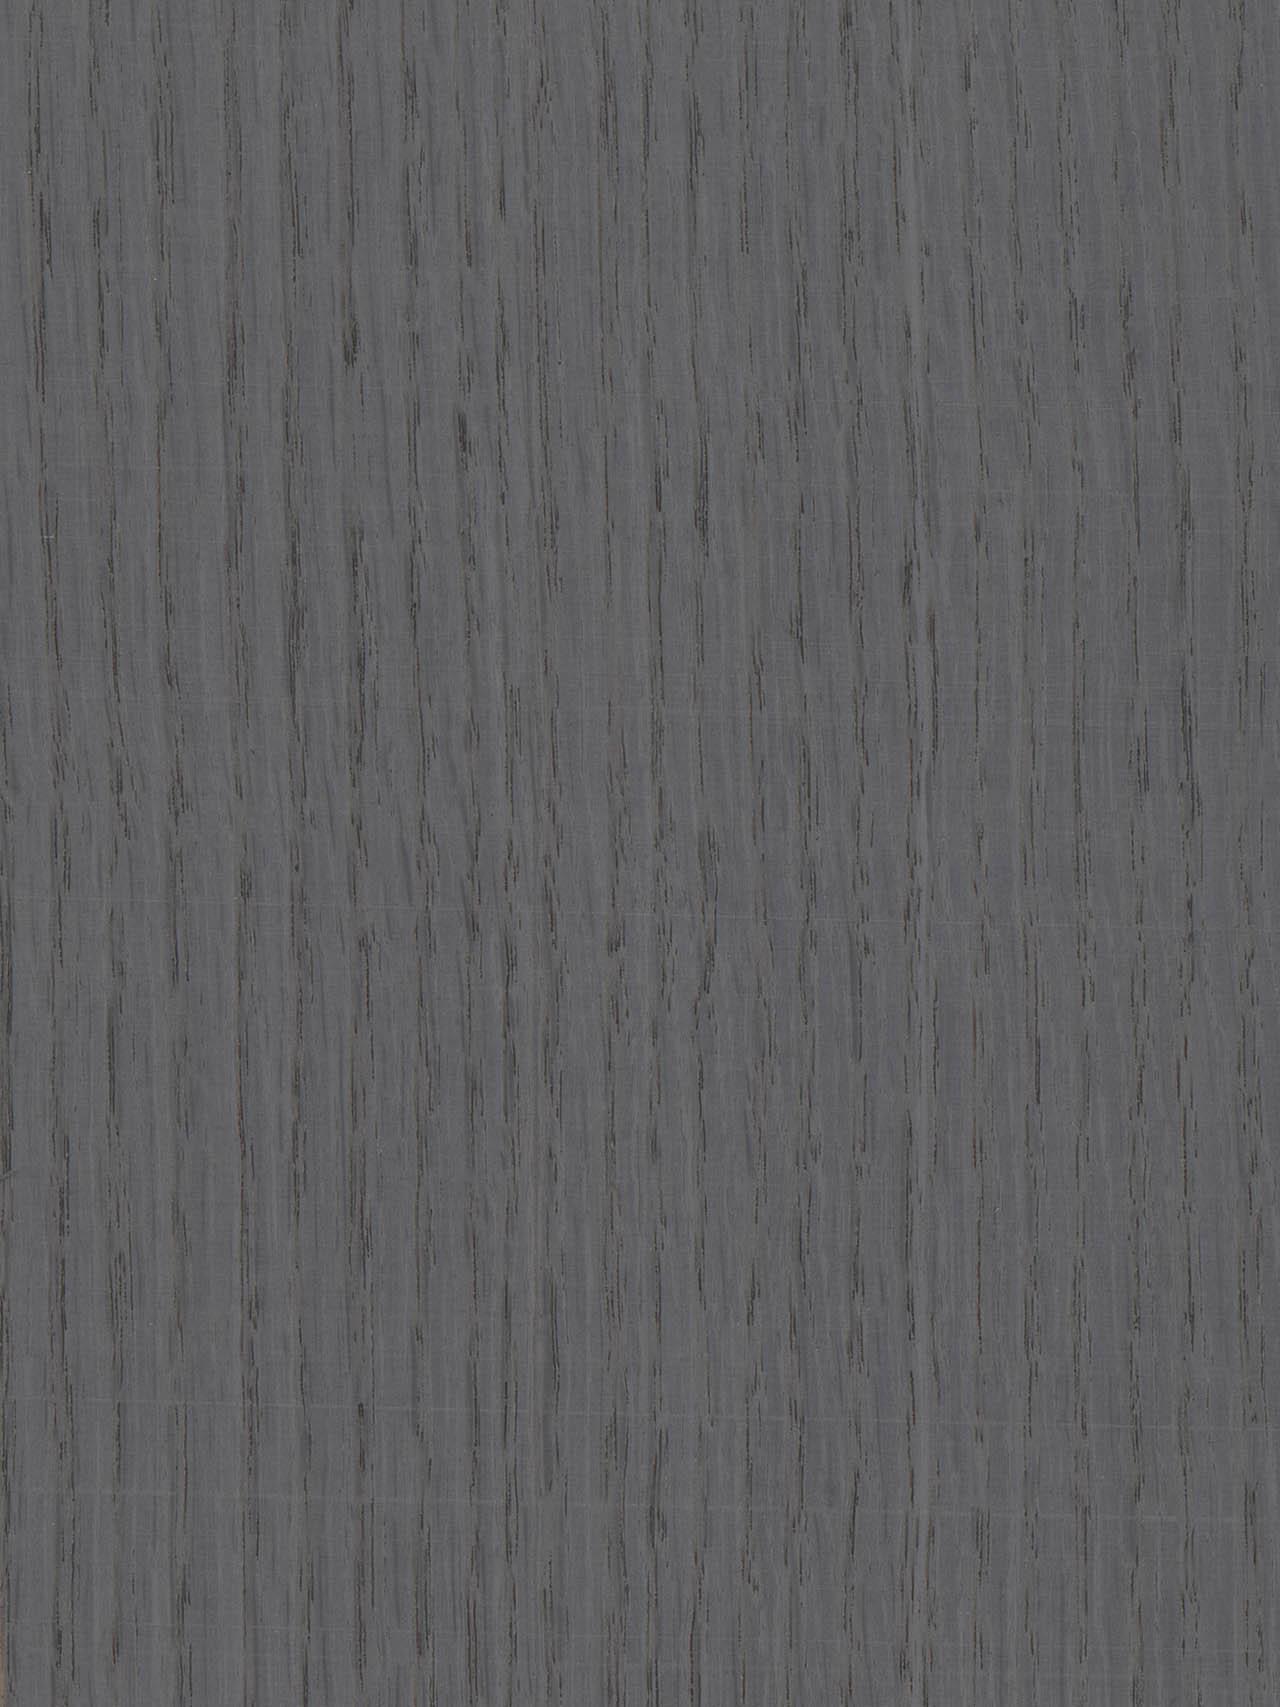 Chapa madera Roble Ceniza GBF106 Losán